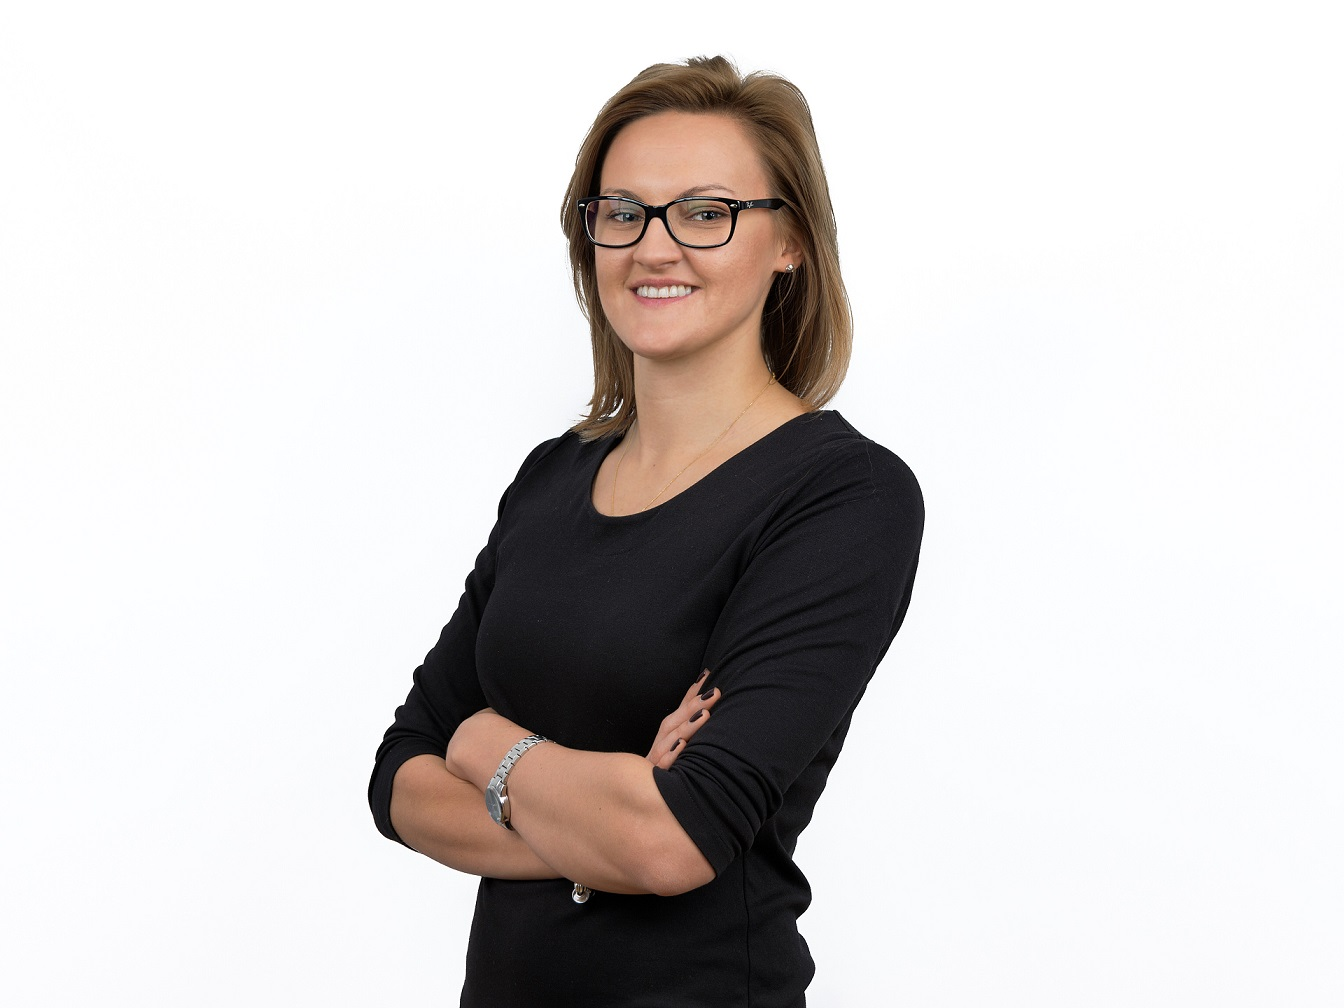 Joanna Budzis